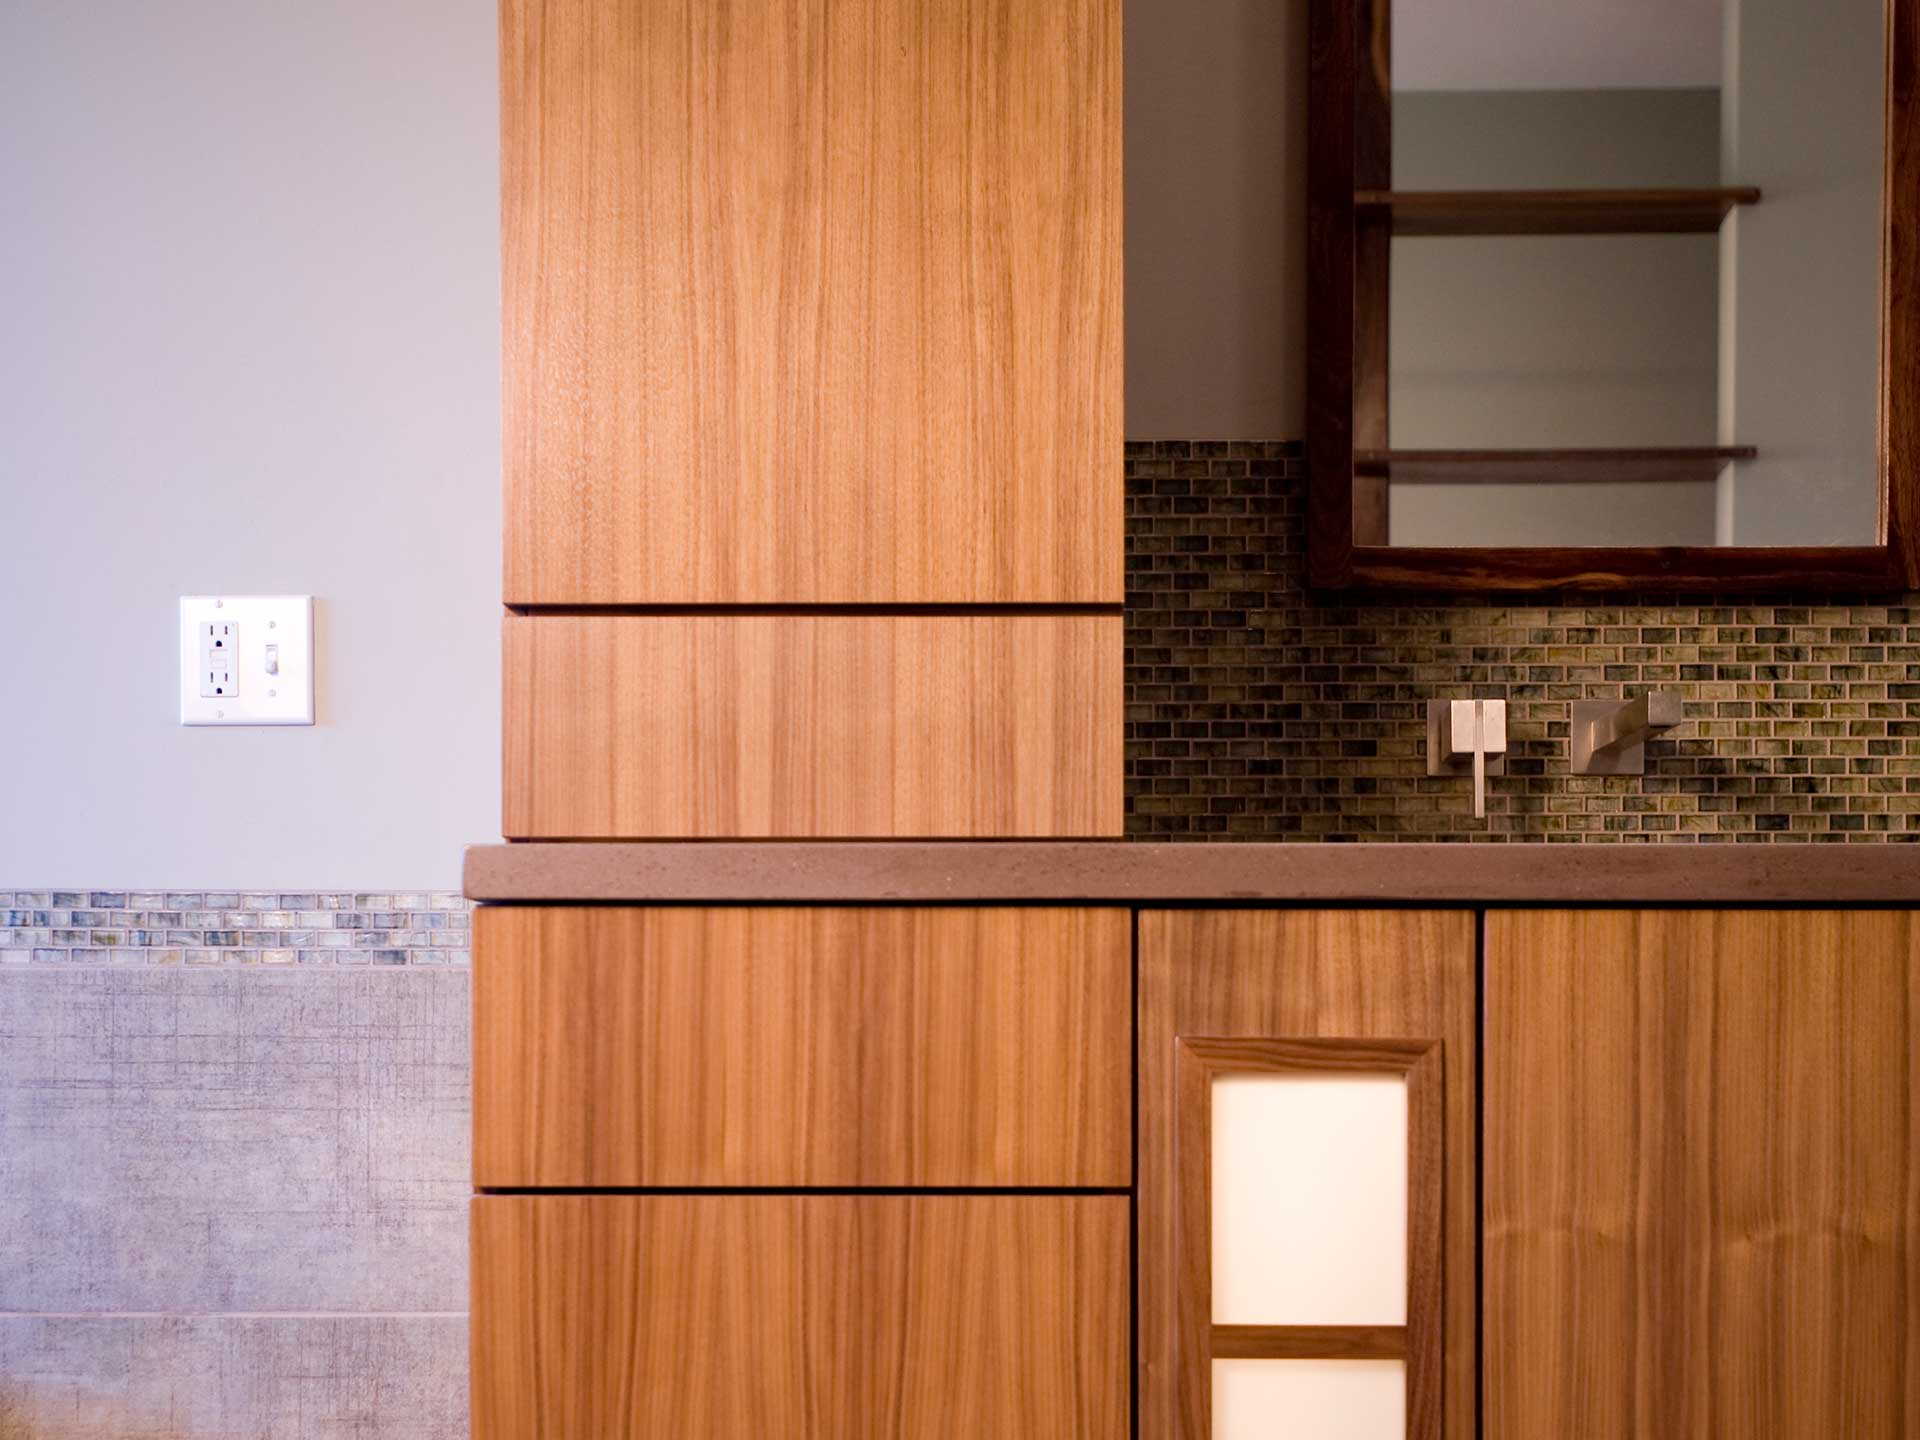 midwest-remodeling-bathroom-remodel-4